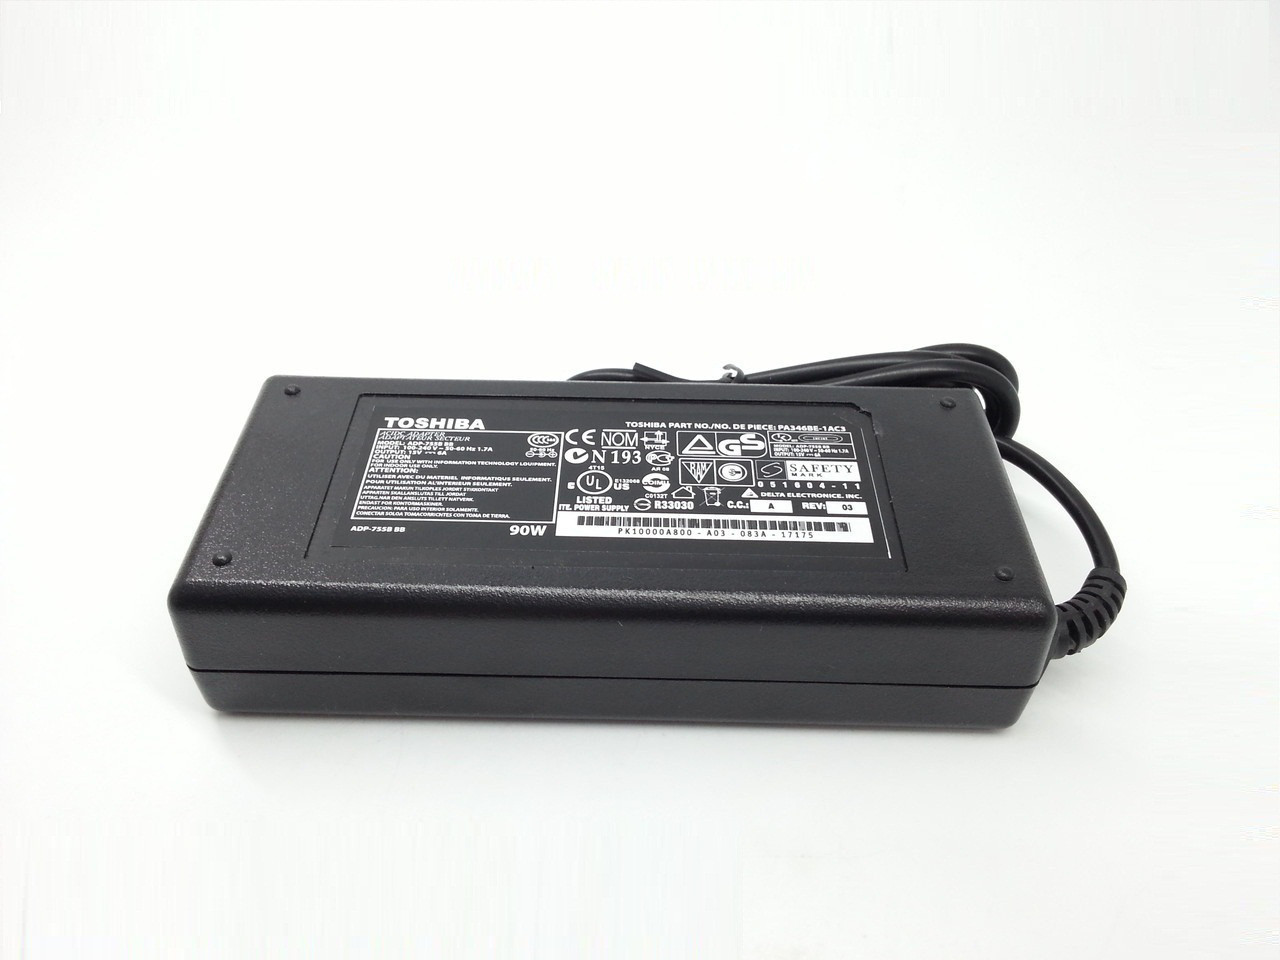 Блок питания для ноутбука Toshiba Satellite 2655XDVD 15V 6A 90W 6.3*3.0mm